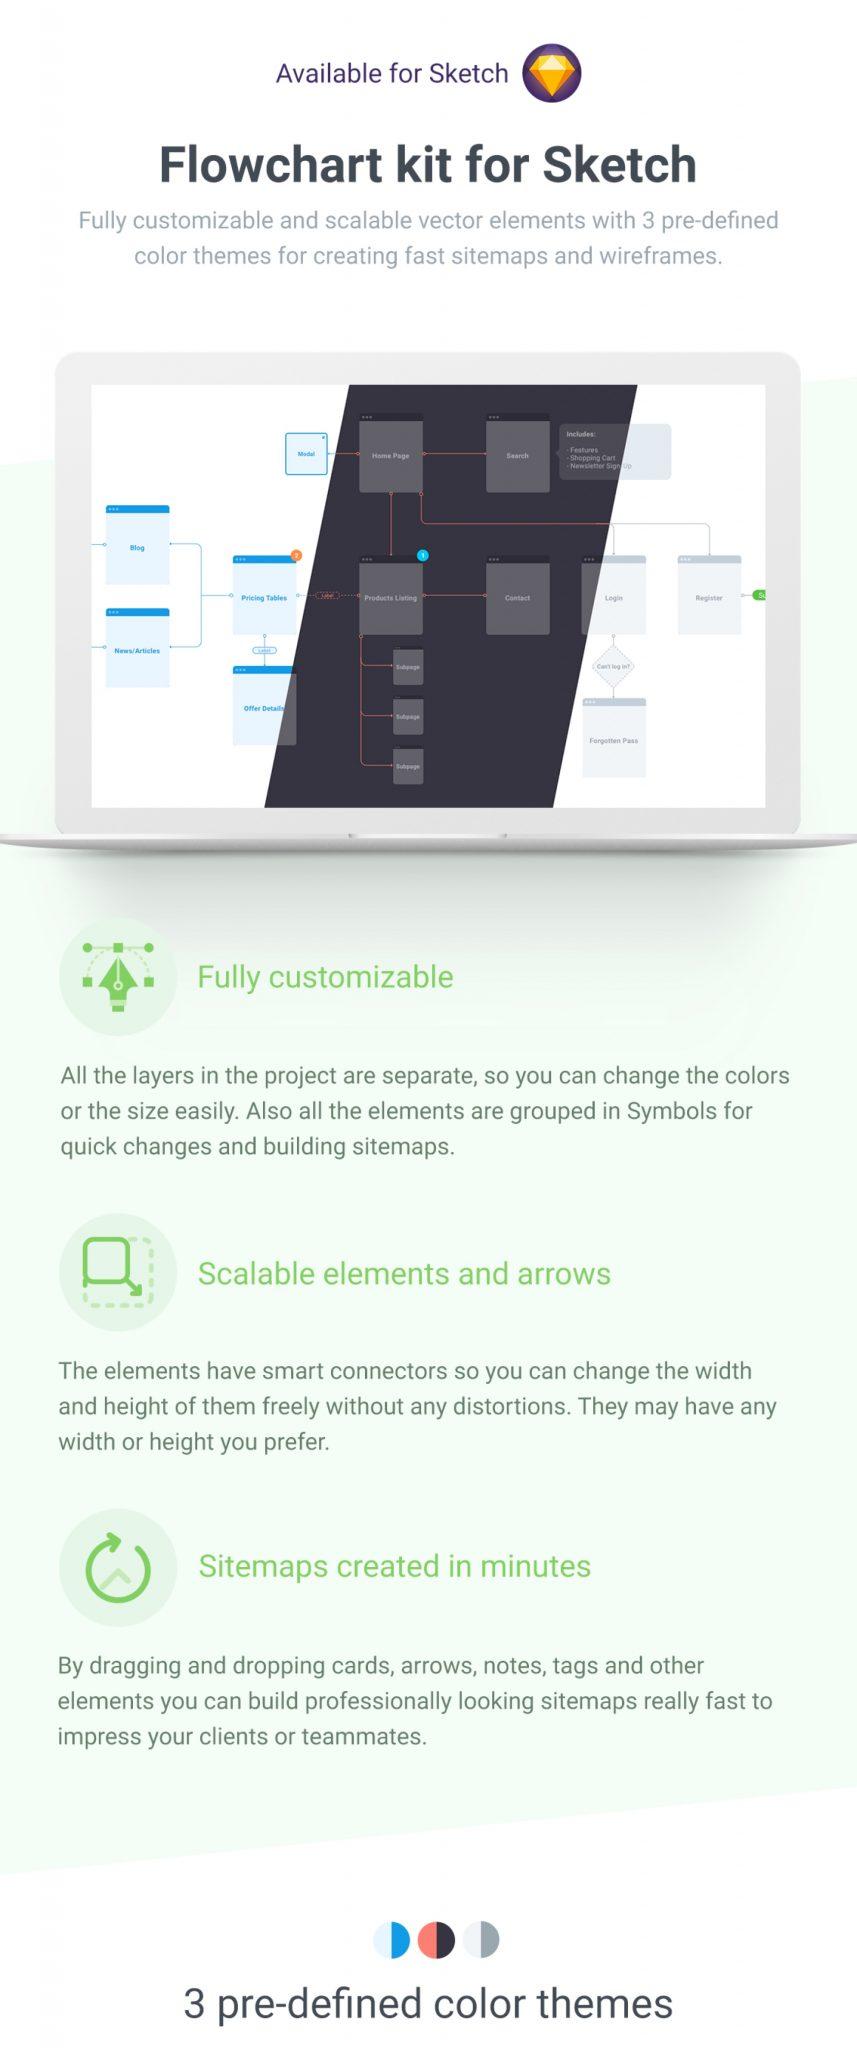 UX Flowchart Kit for Sketch - Easy sitemap creator for freelancers